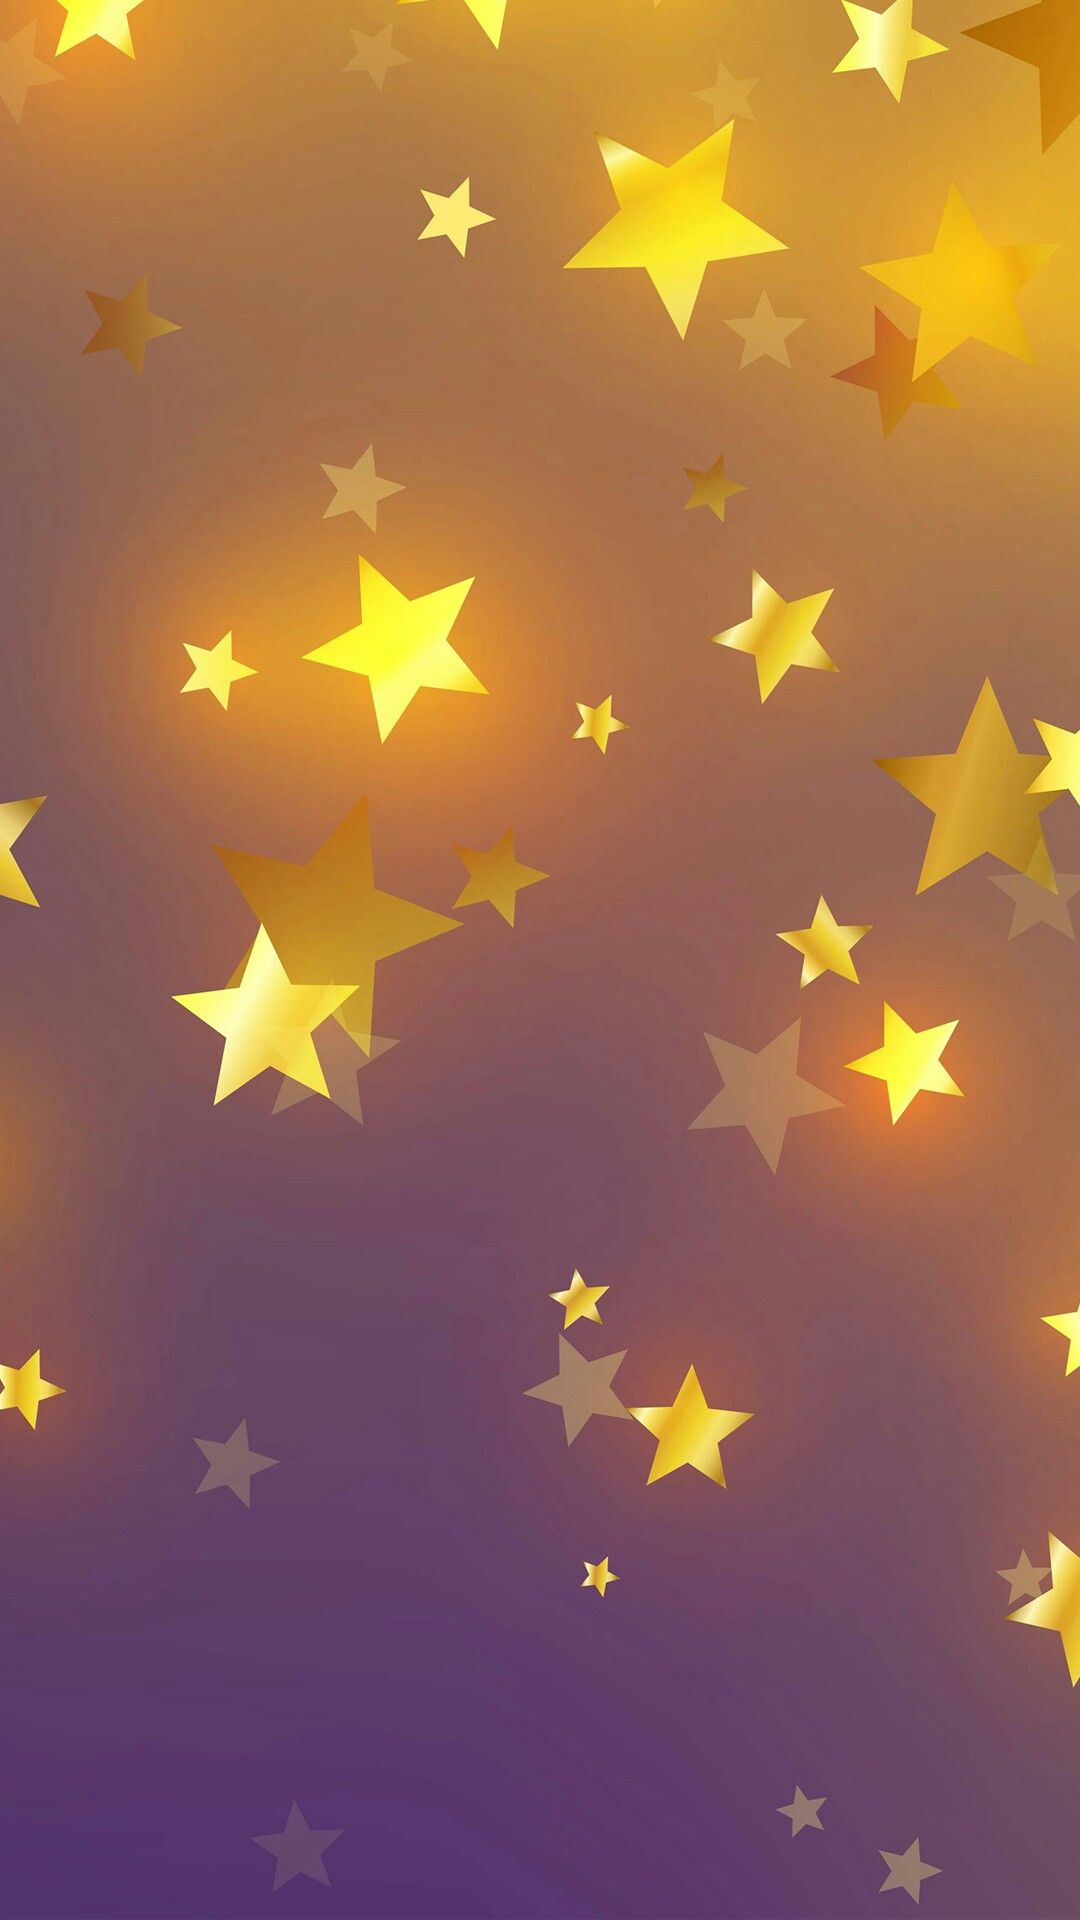 Stars Star Wallpaper Cute Wallpaper Backgrounds Beautiful Wallpapers